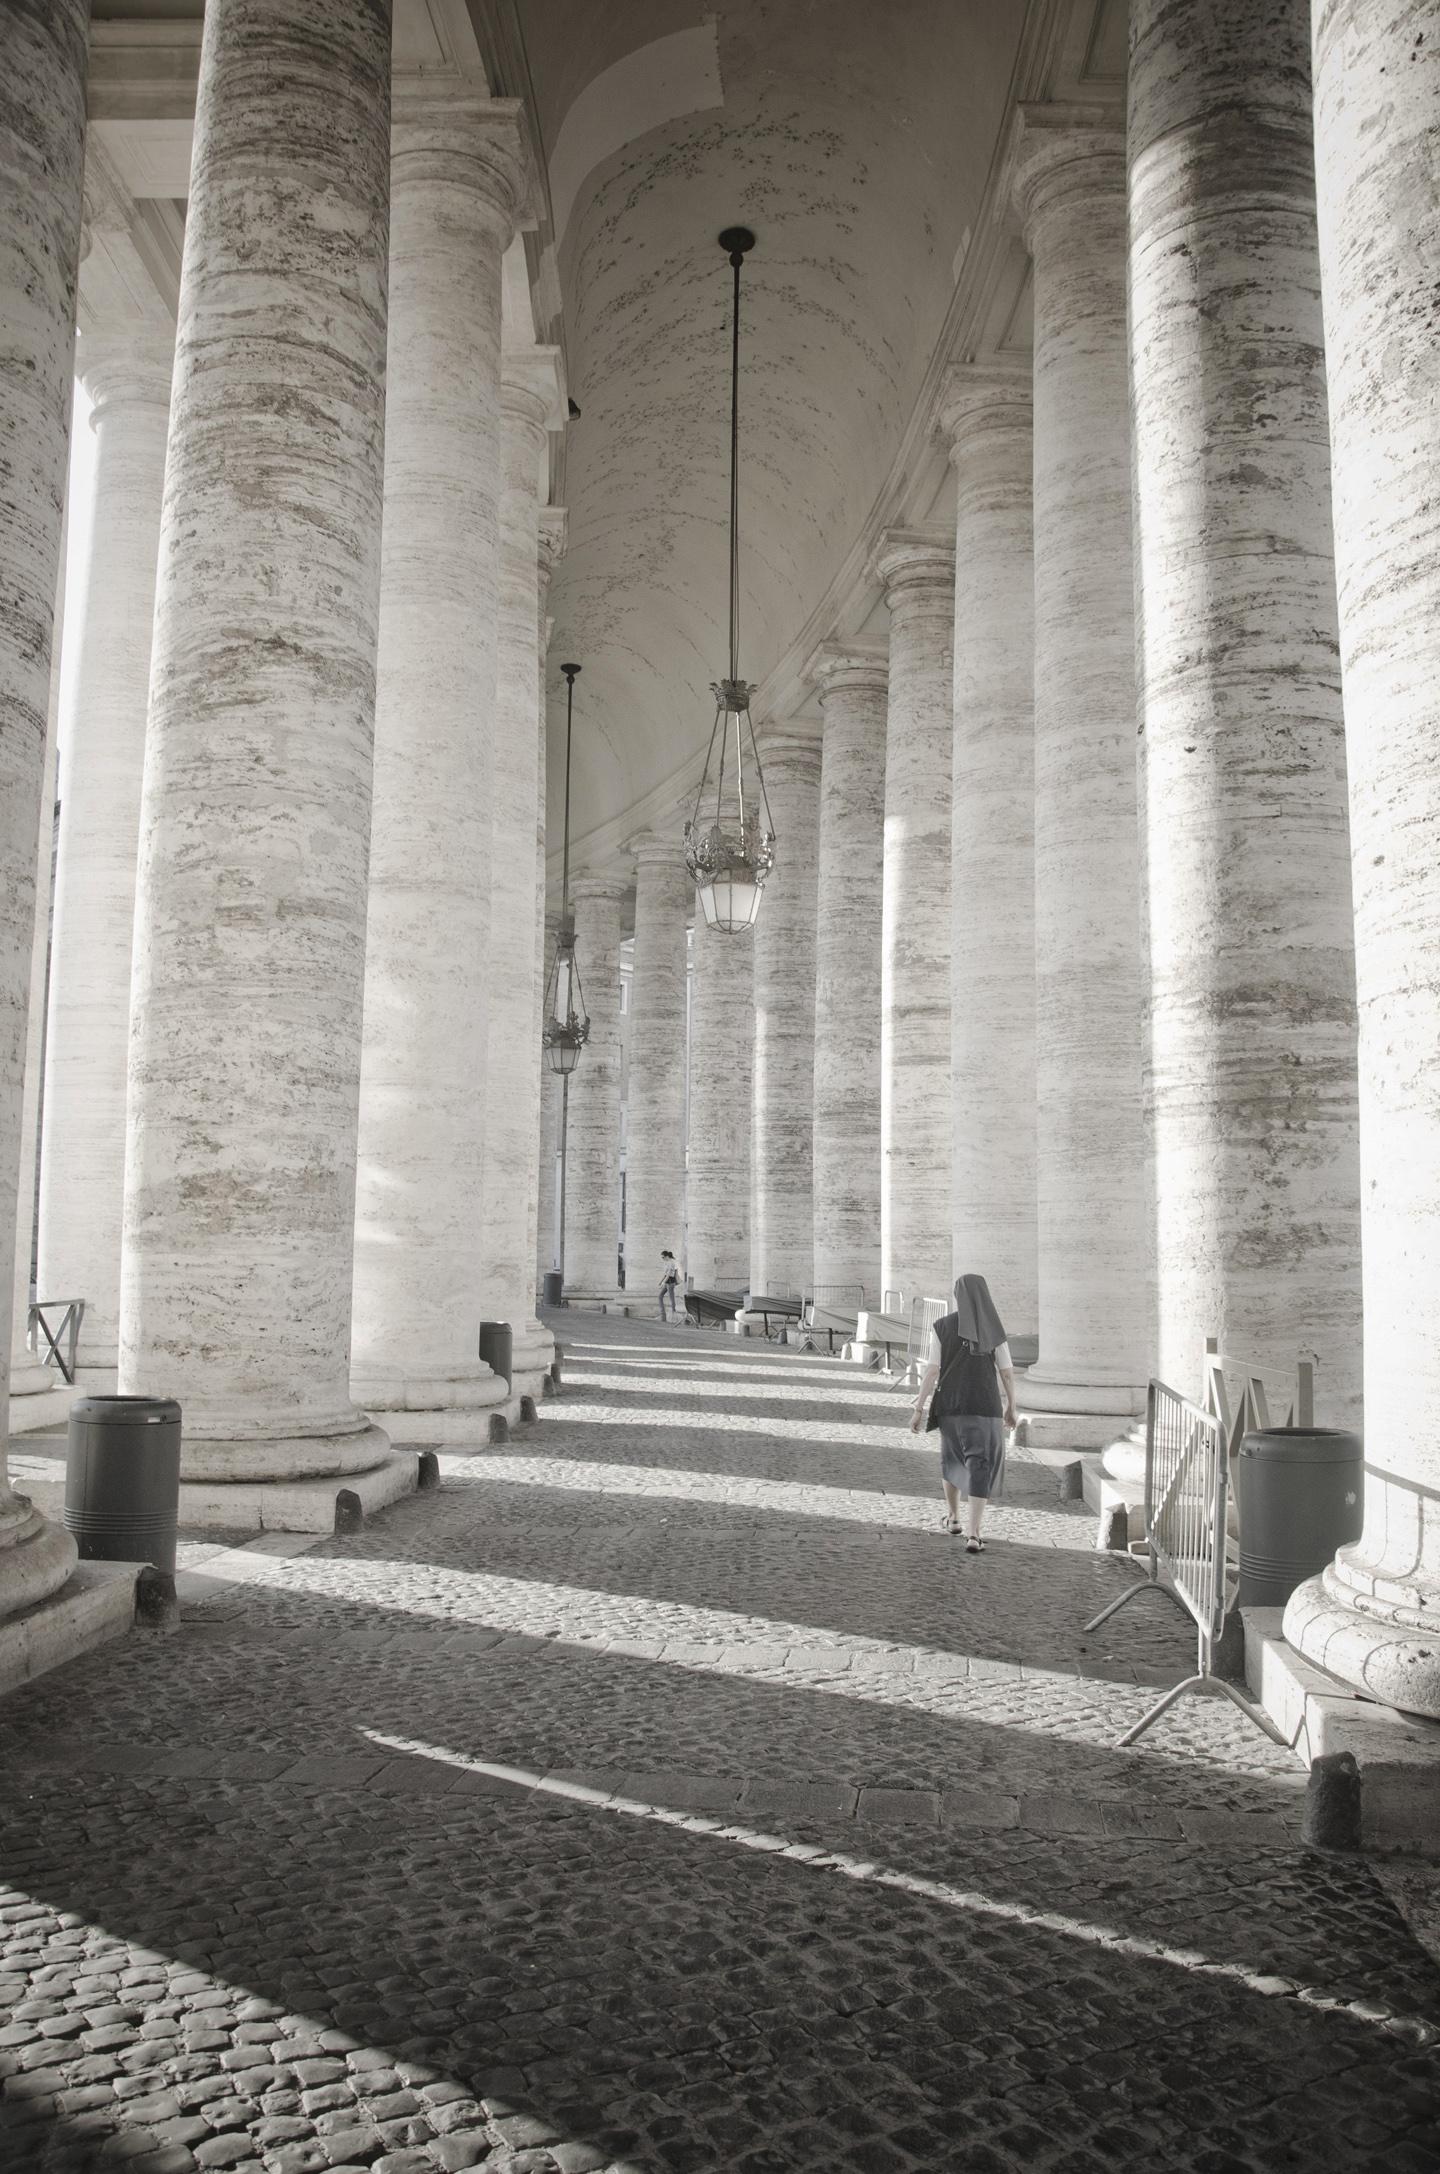 Rome_30AUGUST2011_Vaticano_0240.jpg